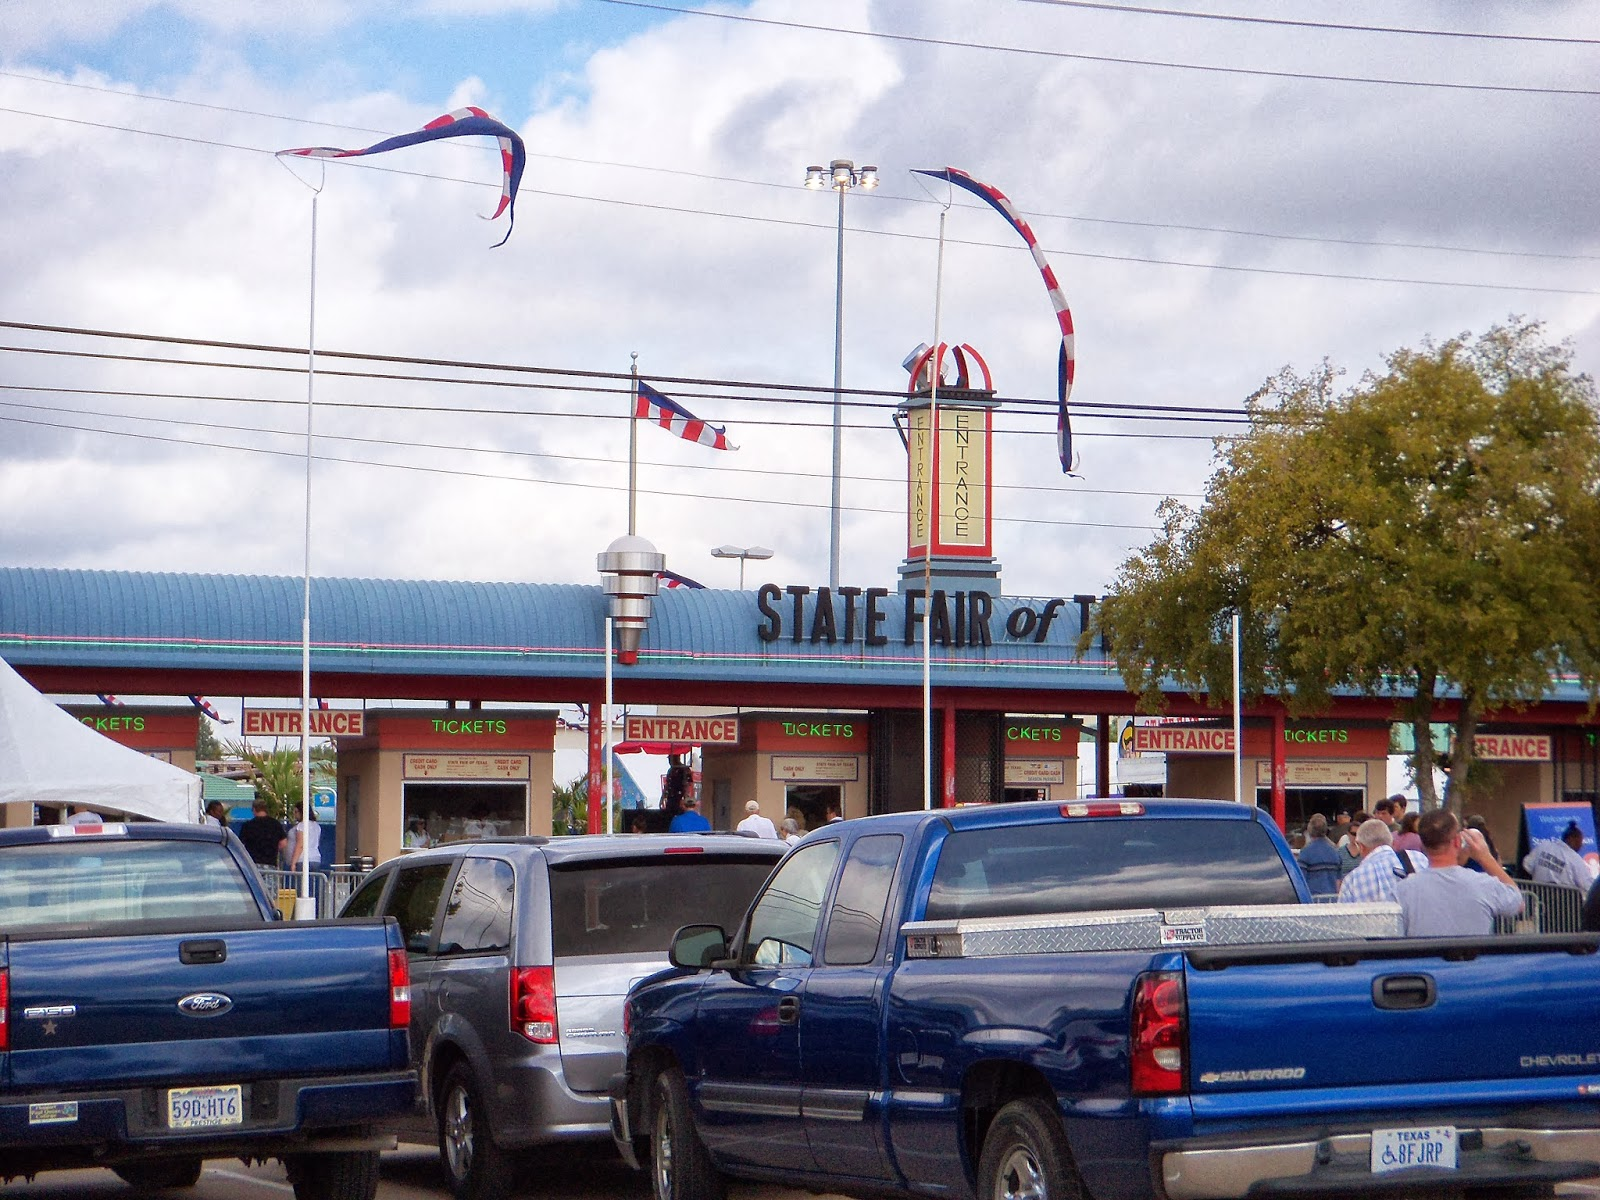 Tinkering Around: State Fair of Texas 2013